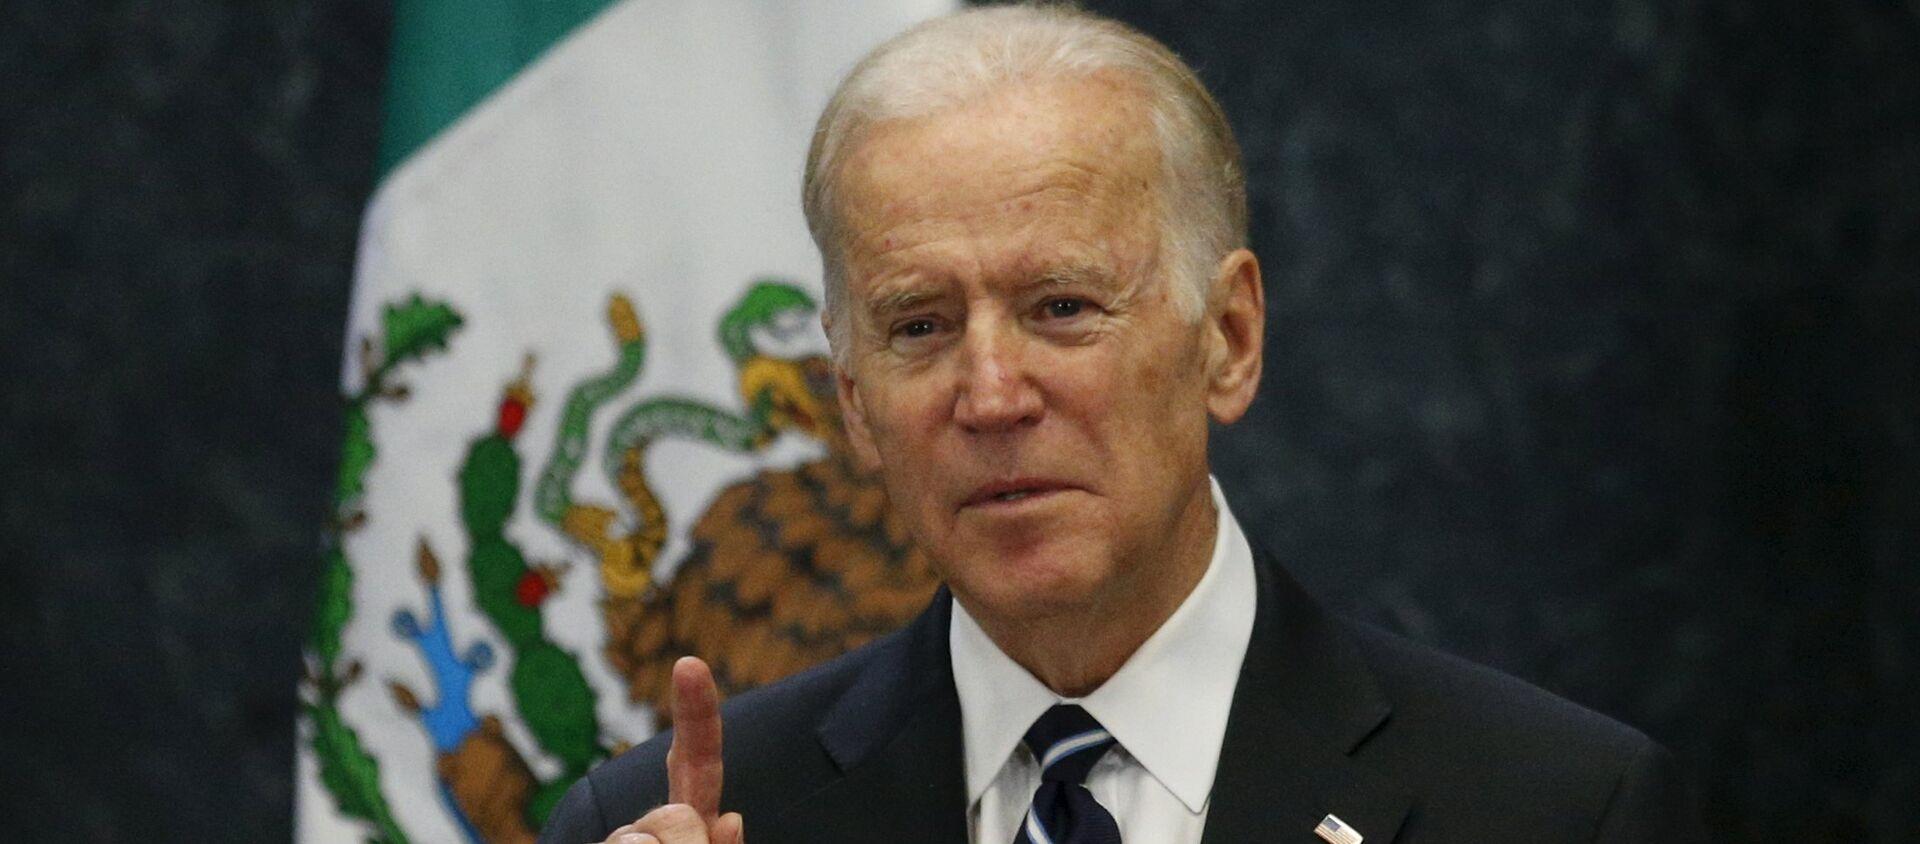 U.S. Vice President Joe Biden delivers a speech - Sputnik Mundo, 1920, 21.08.2020